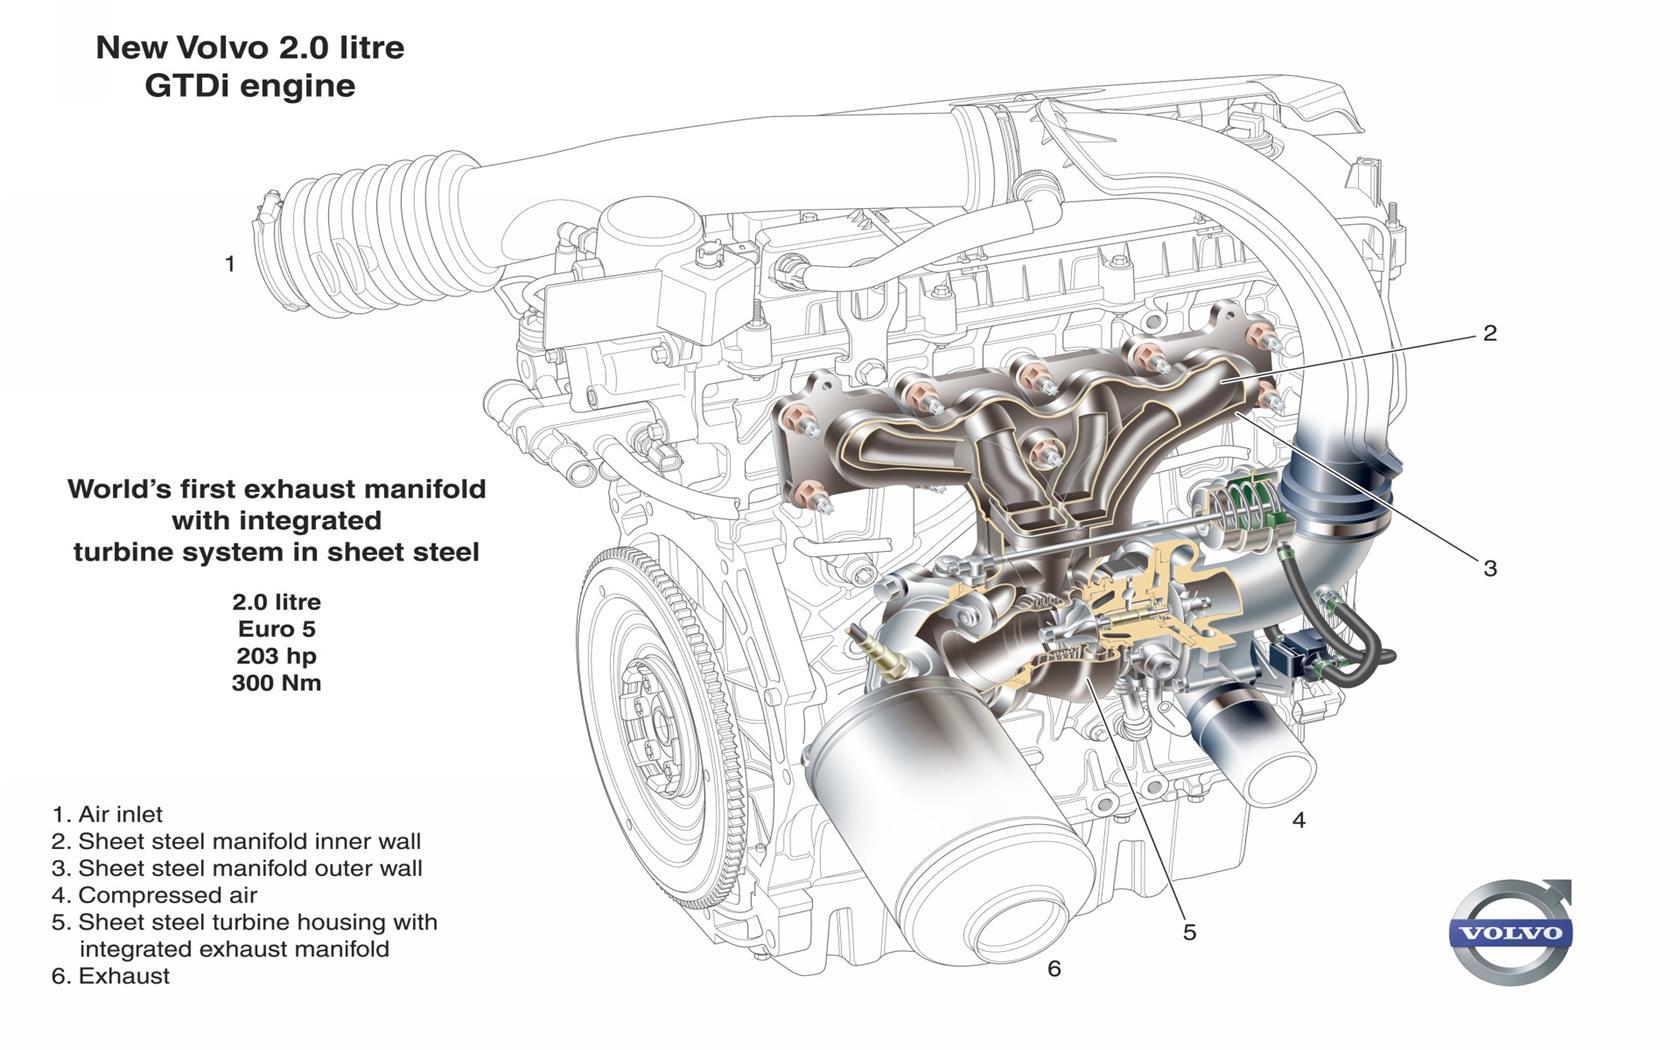 2011 volvo xc60 image photo 13 of 29 Kia Soul Engine Diagram